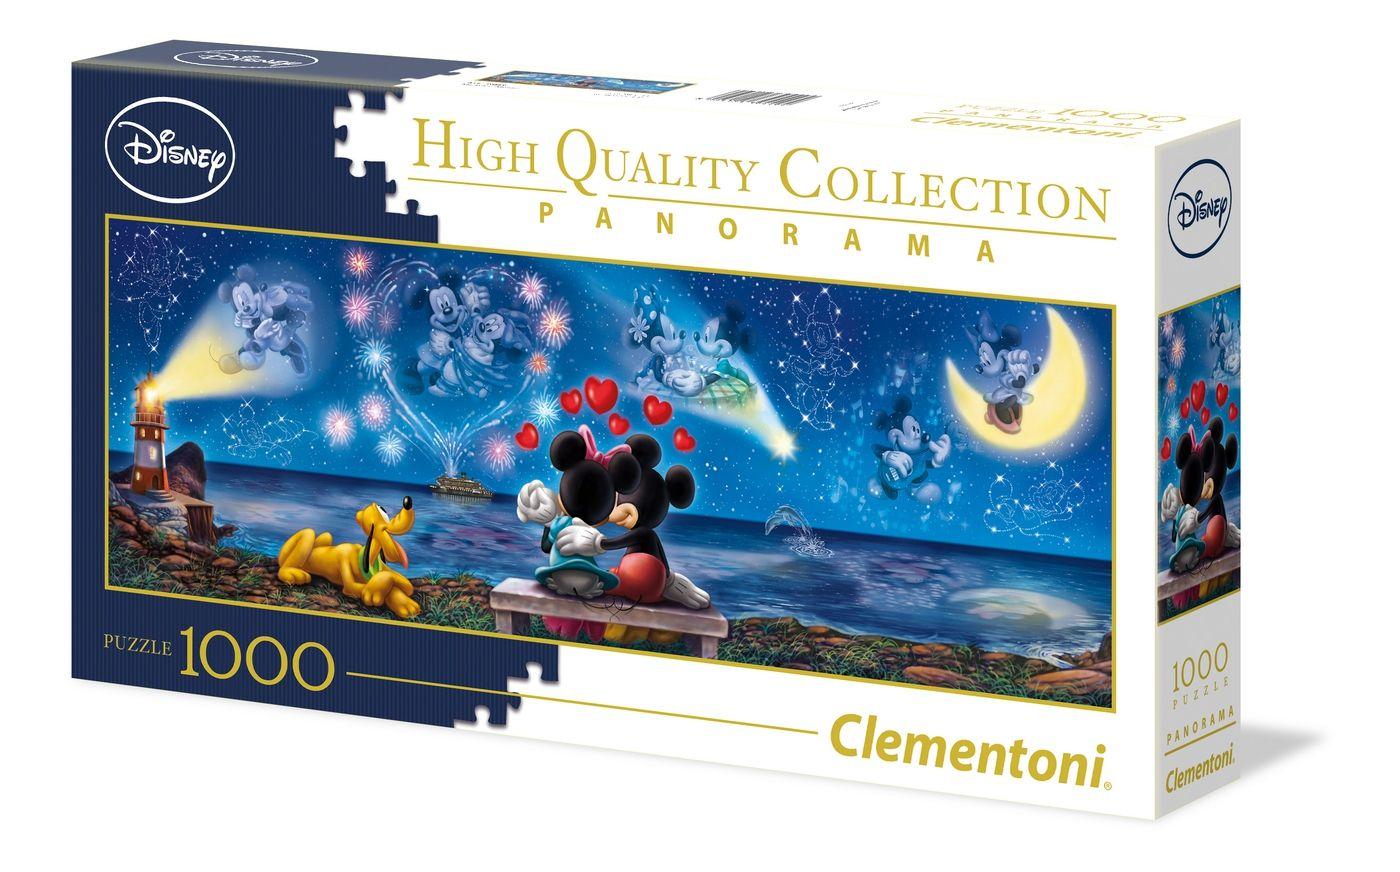 Clementoni Serie Panorama Disney 1000pz